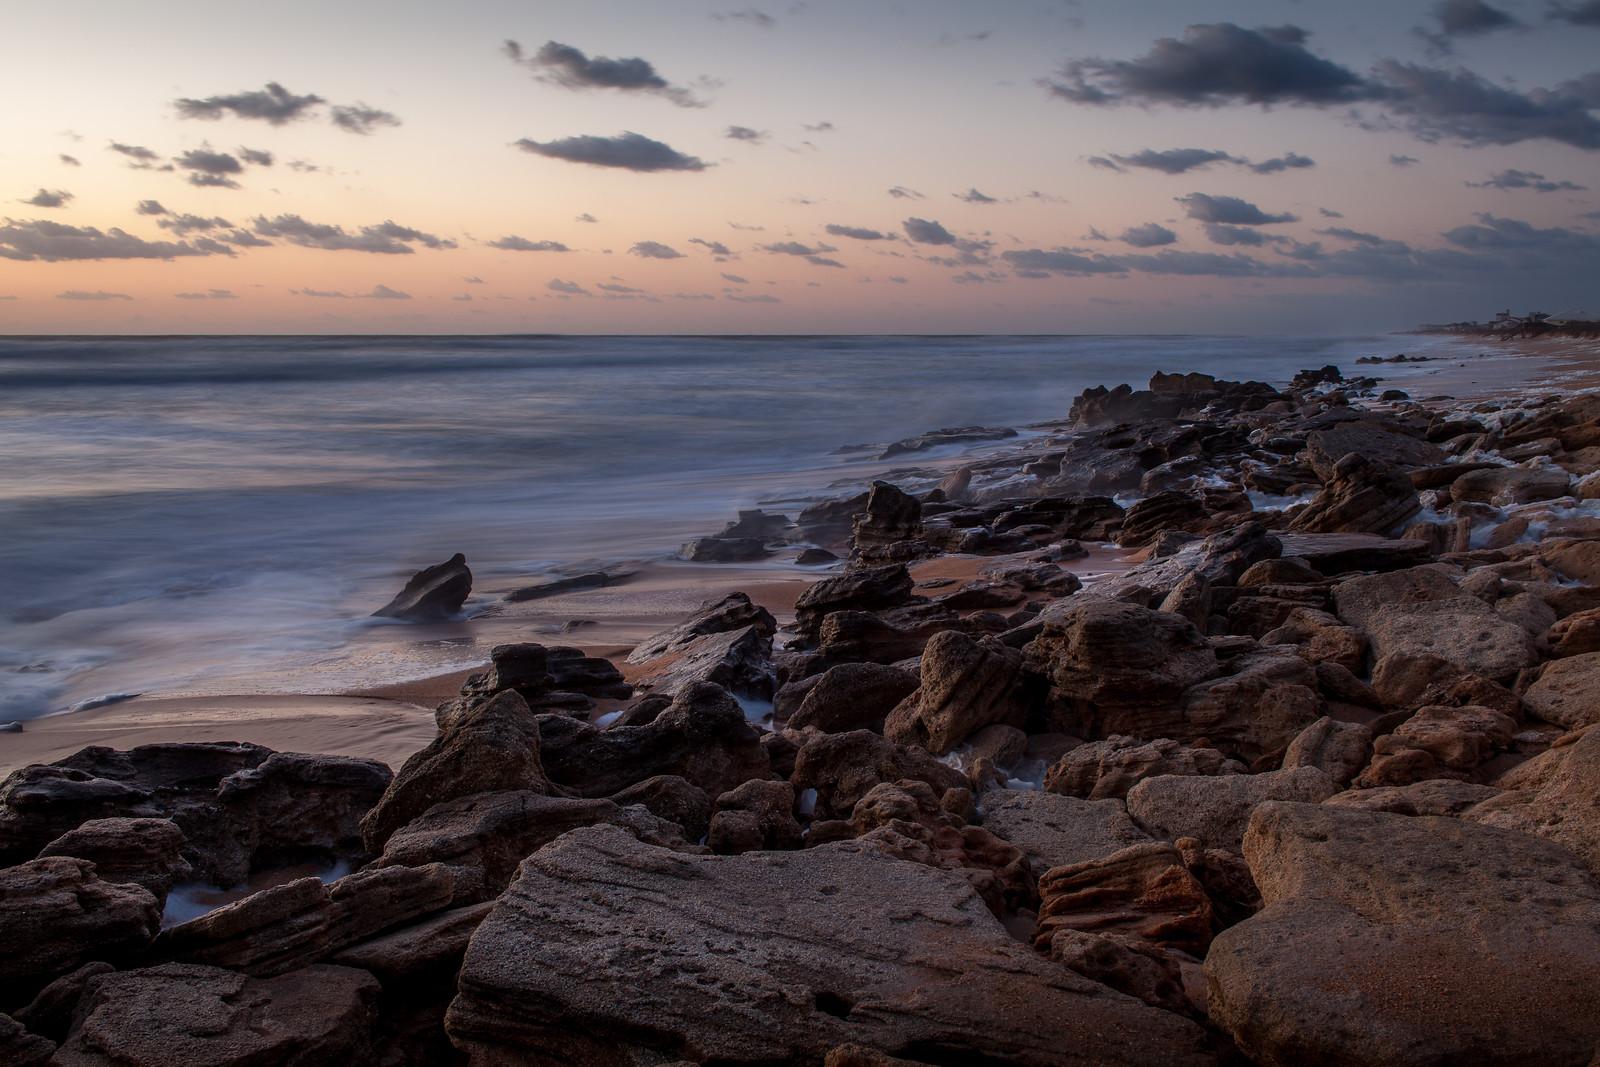 Along a Restless Shore